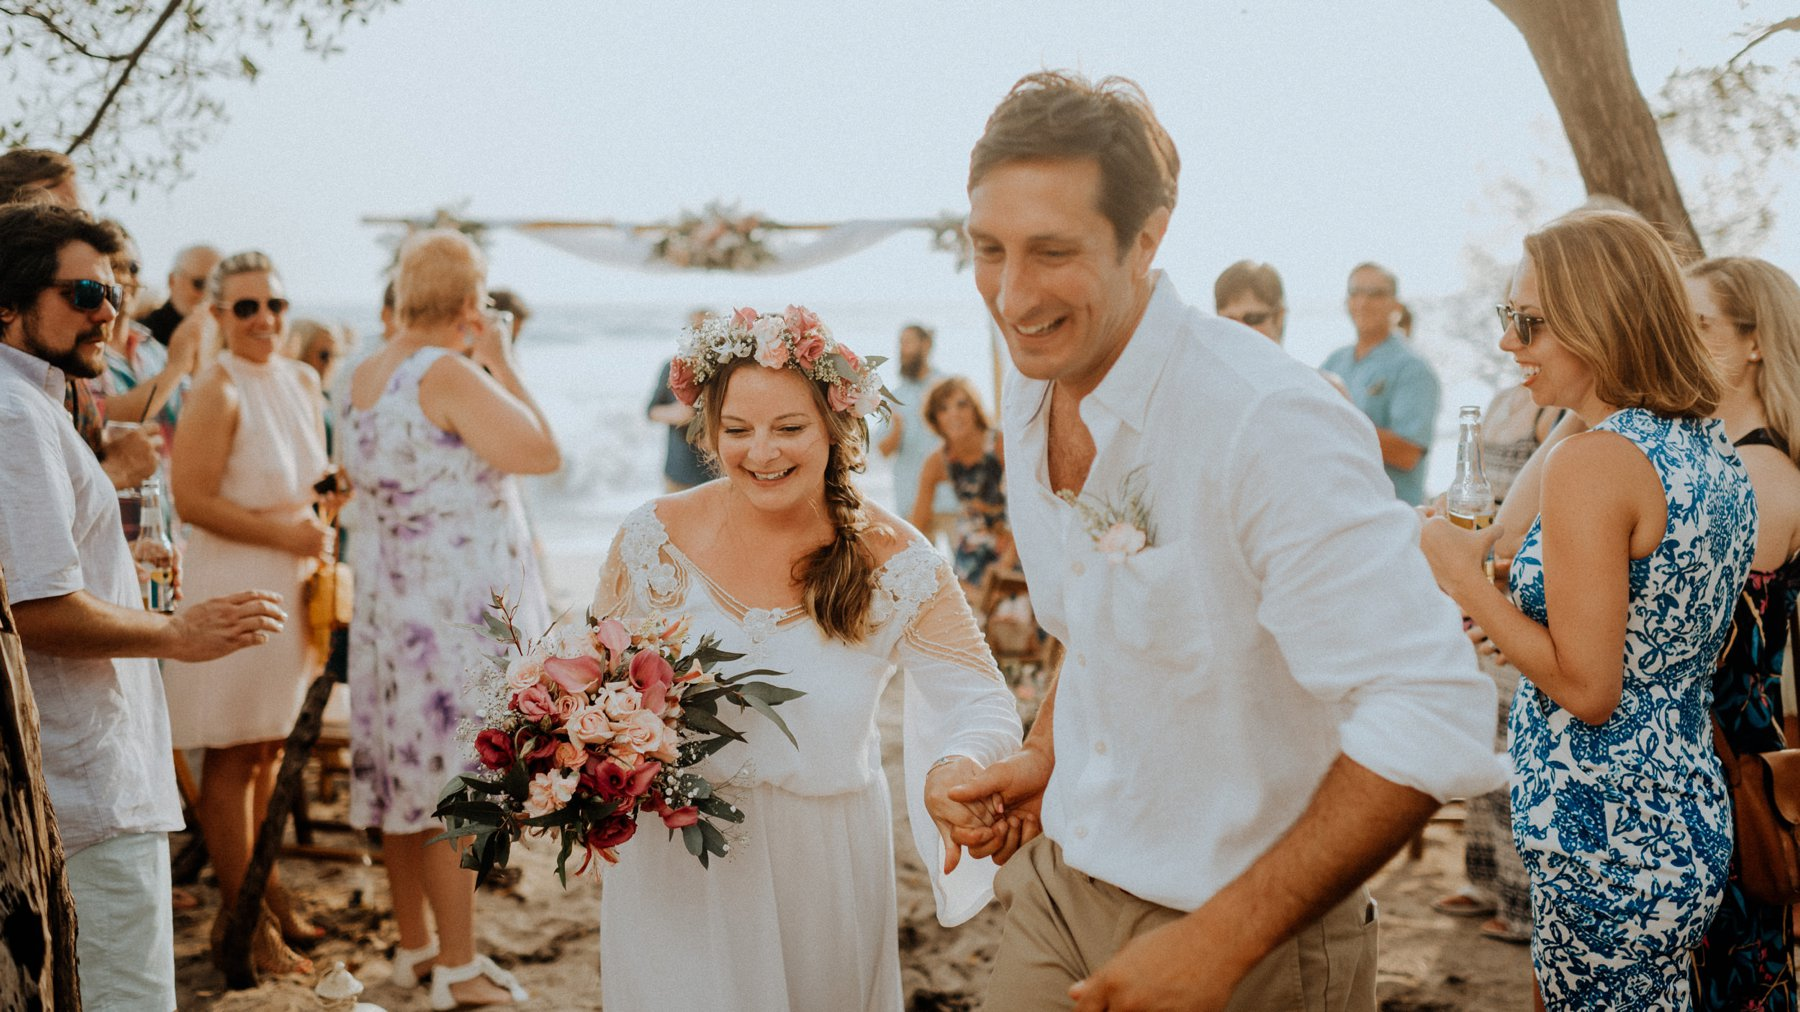 019-120-costa-rica-wedding-photographer-10.jpg